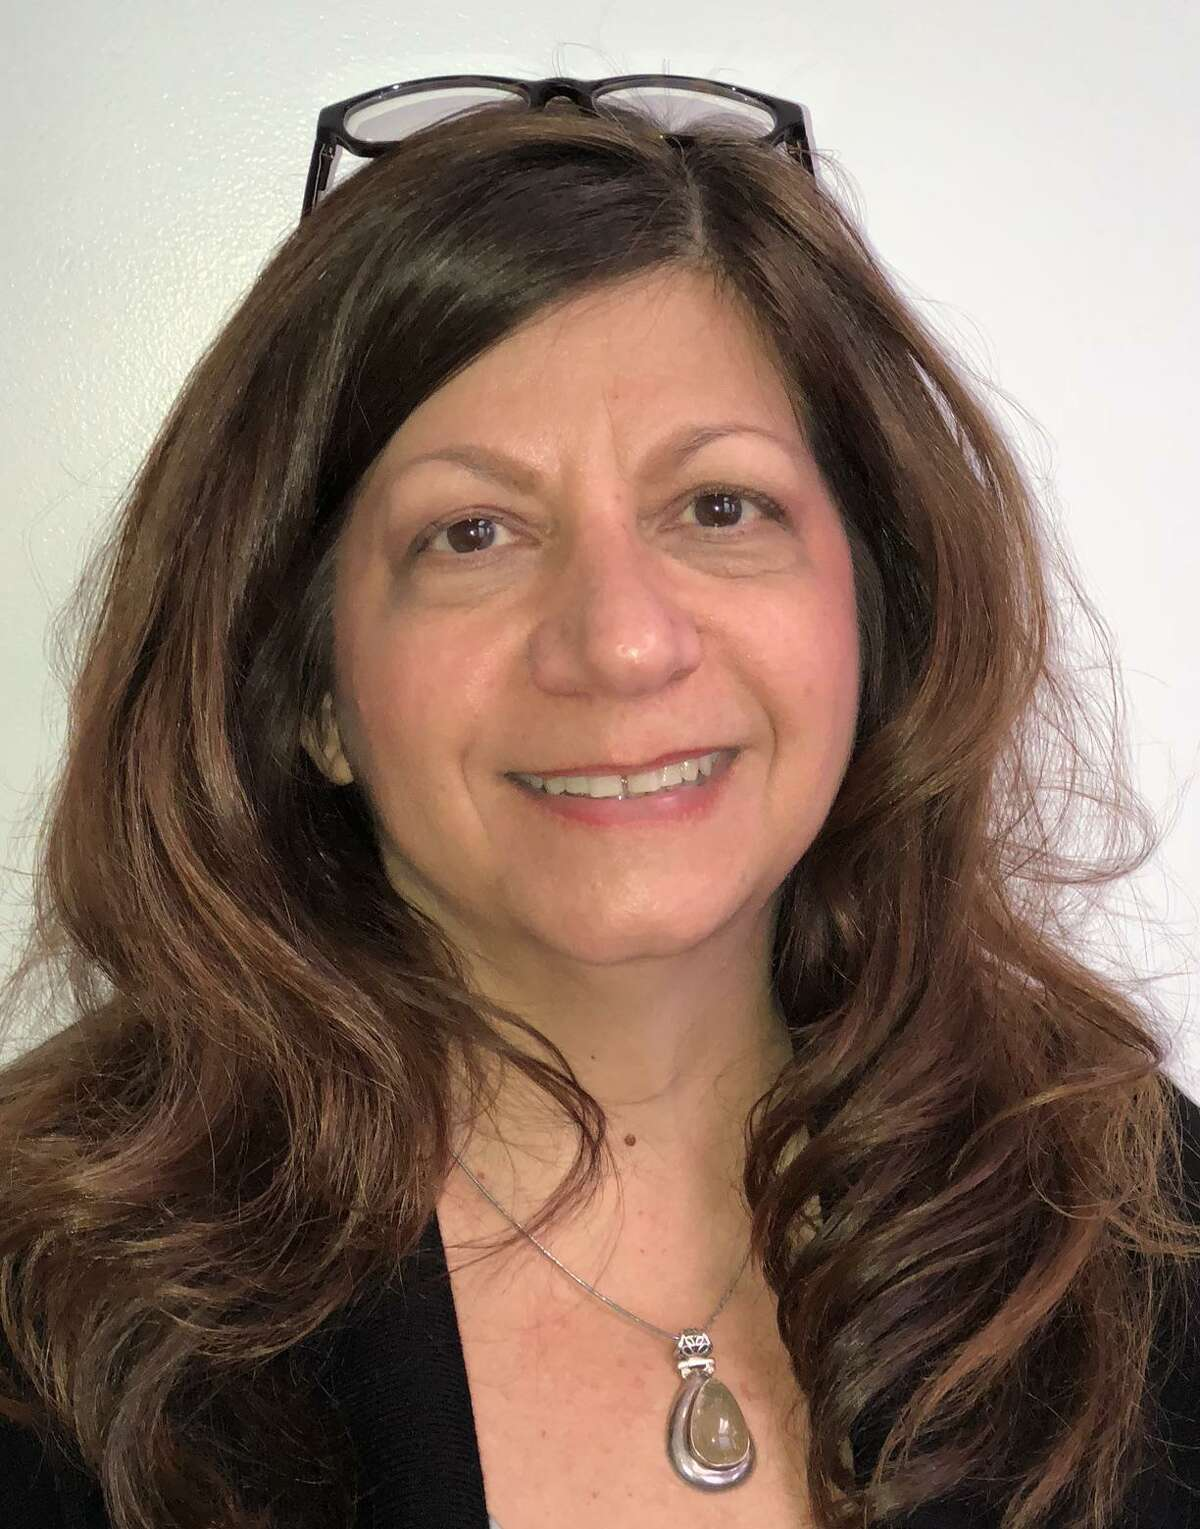 Denise Fucci